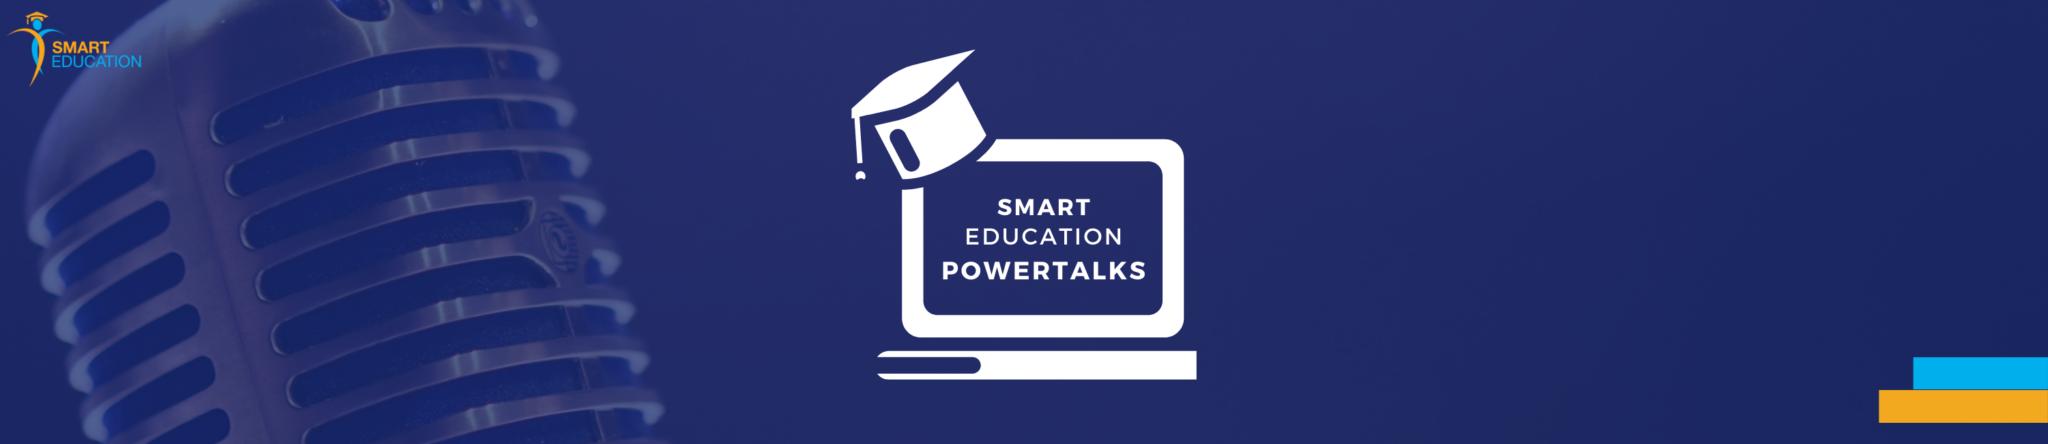 SmartEducation PowerTalks